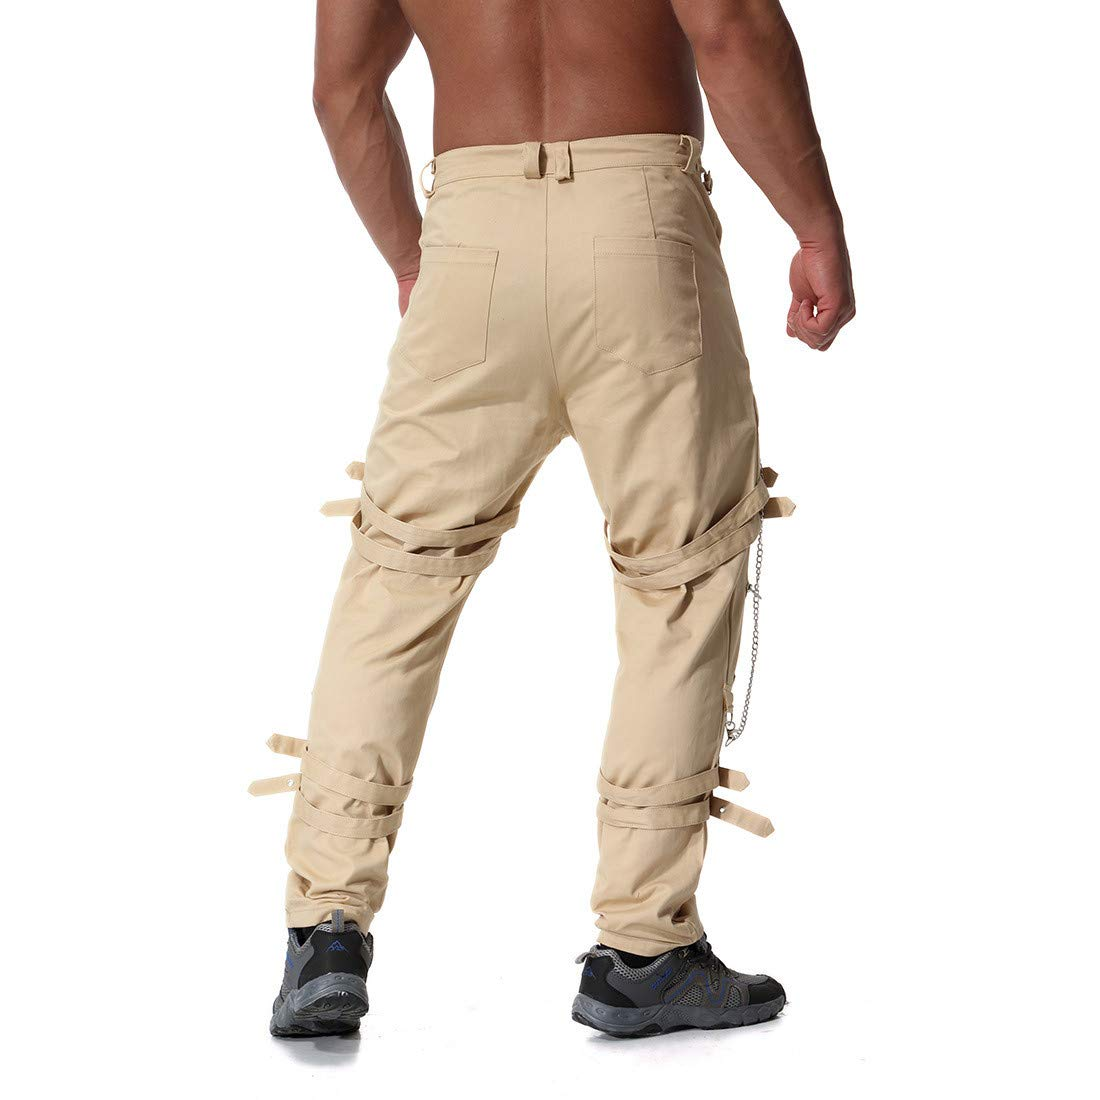 Mens Plus Size Multi Zipper Cotton Vintage Casual Trouser Long Pants Army Green, 35 Memela Clearance!